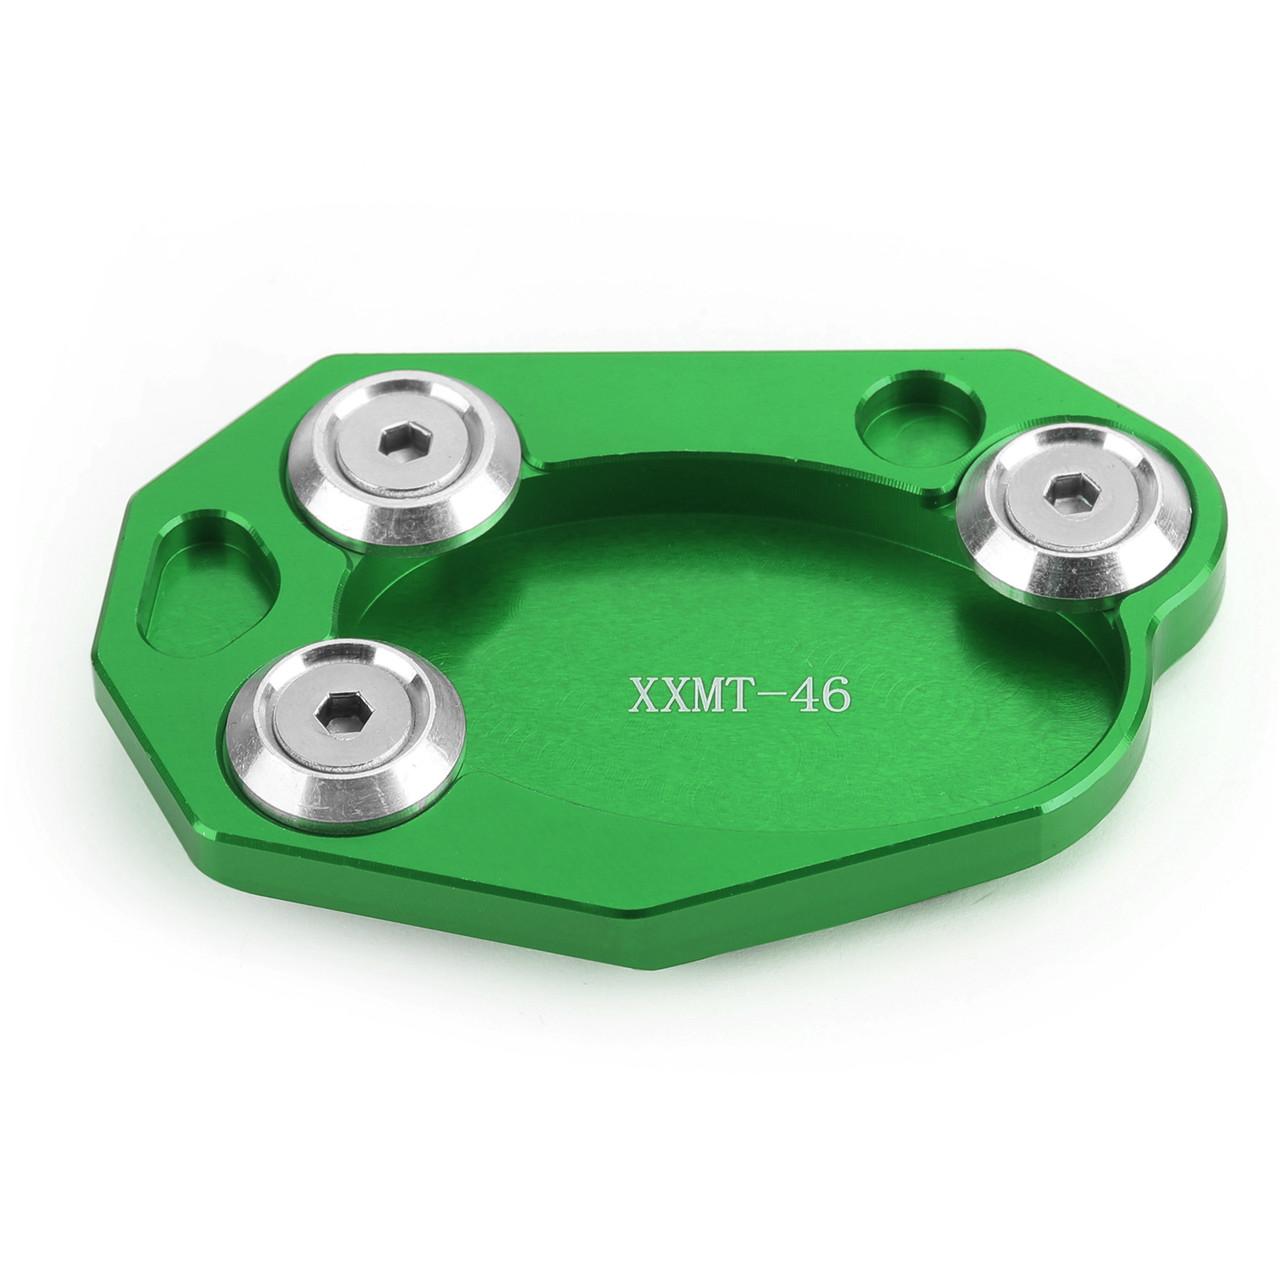 Kickstand Sidestand Extension Foot Plate Pad For Kawasaki Z1000 10-18 ER6N/ER6F 06-15 ZX10R 08-15 ZX6R 09-15 Green